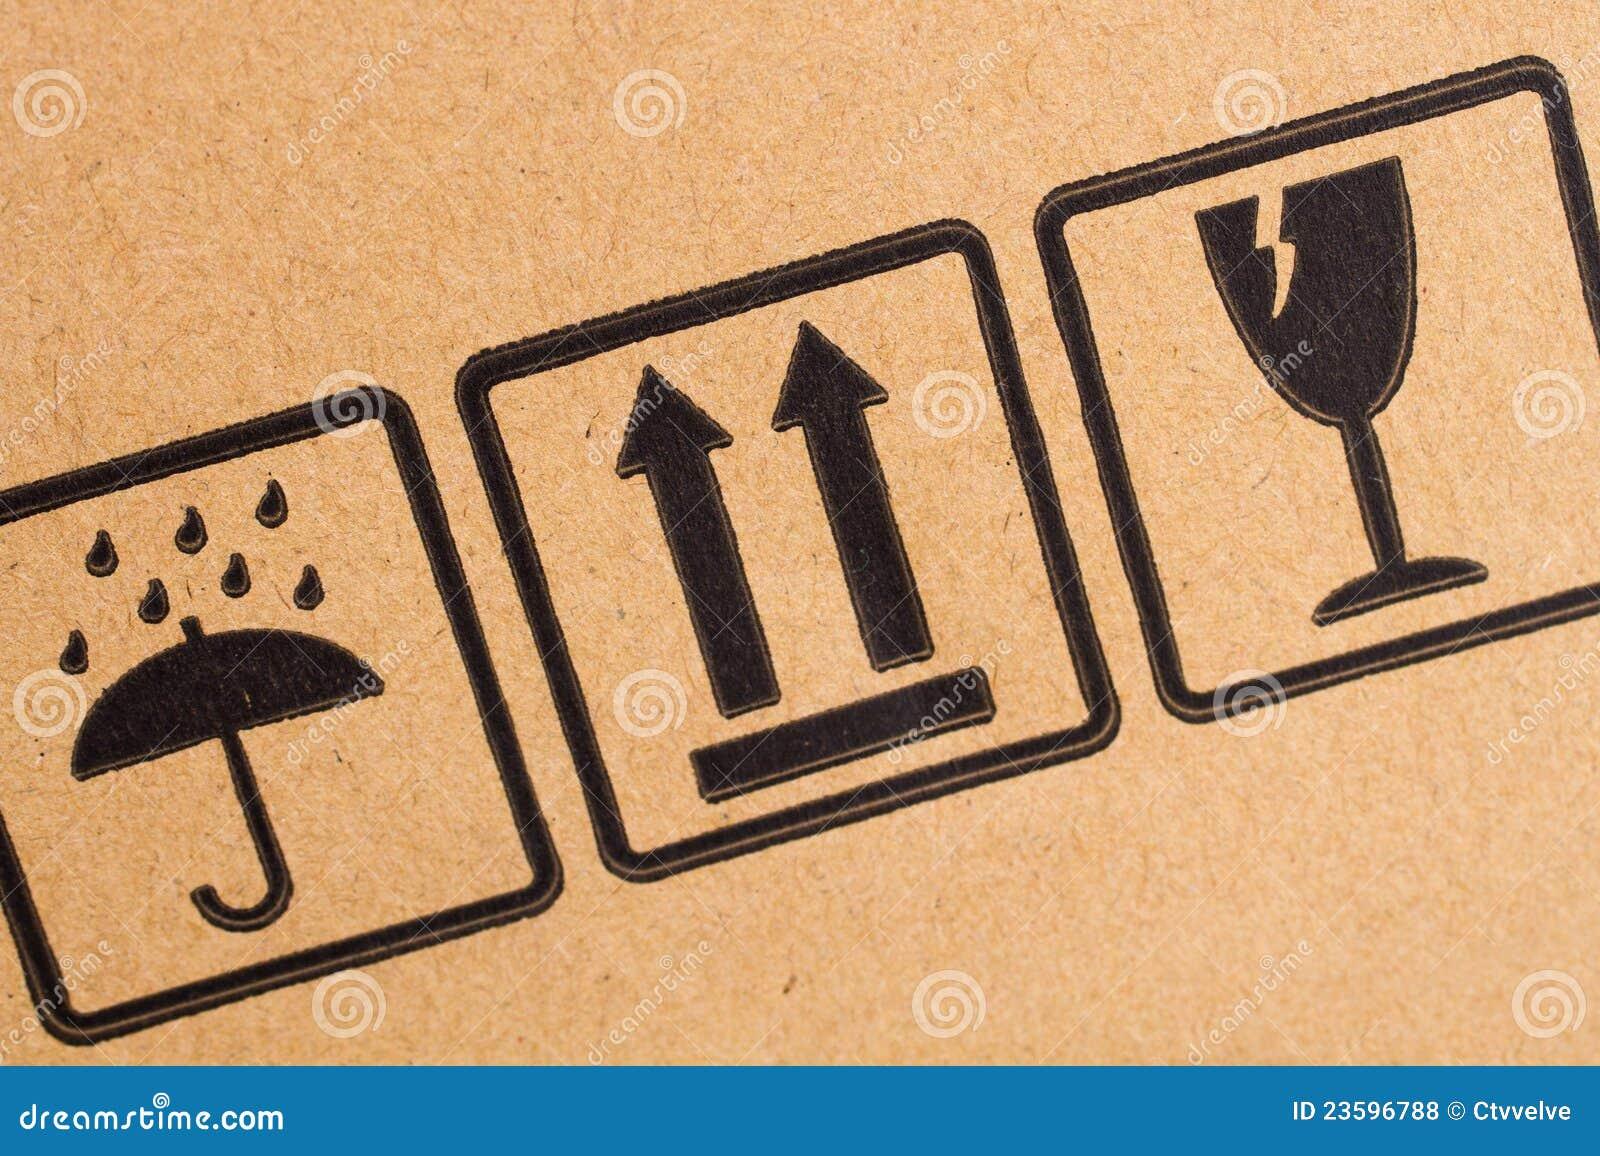 Fragile symbols on cardboard